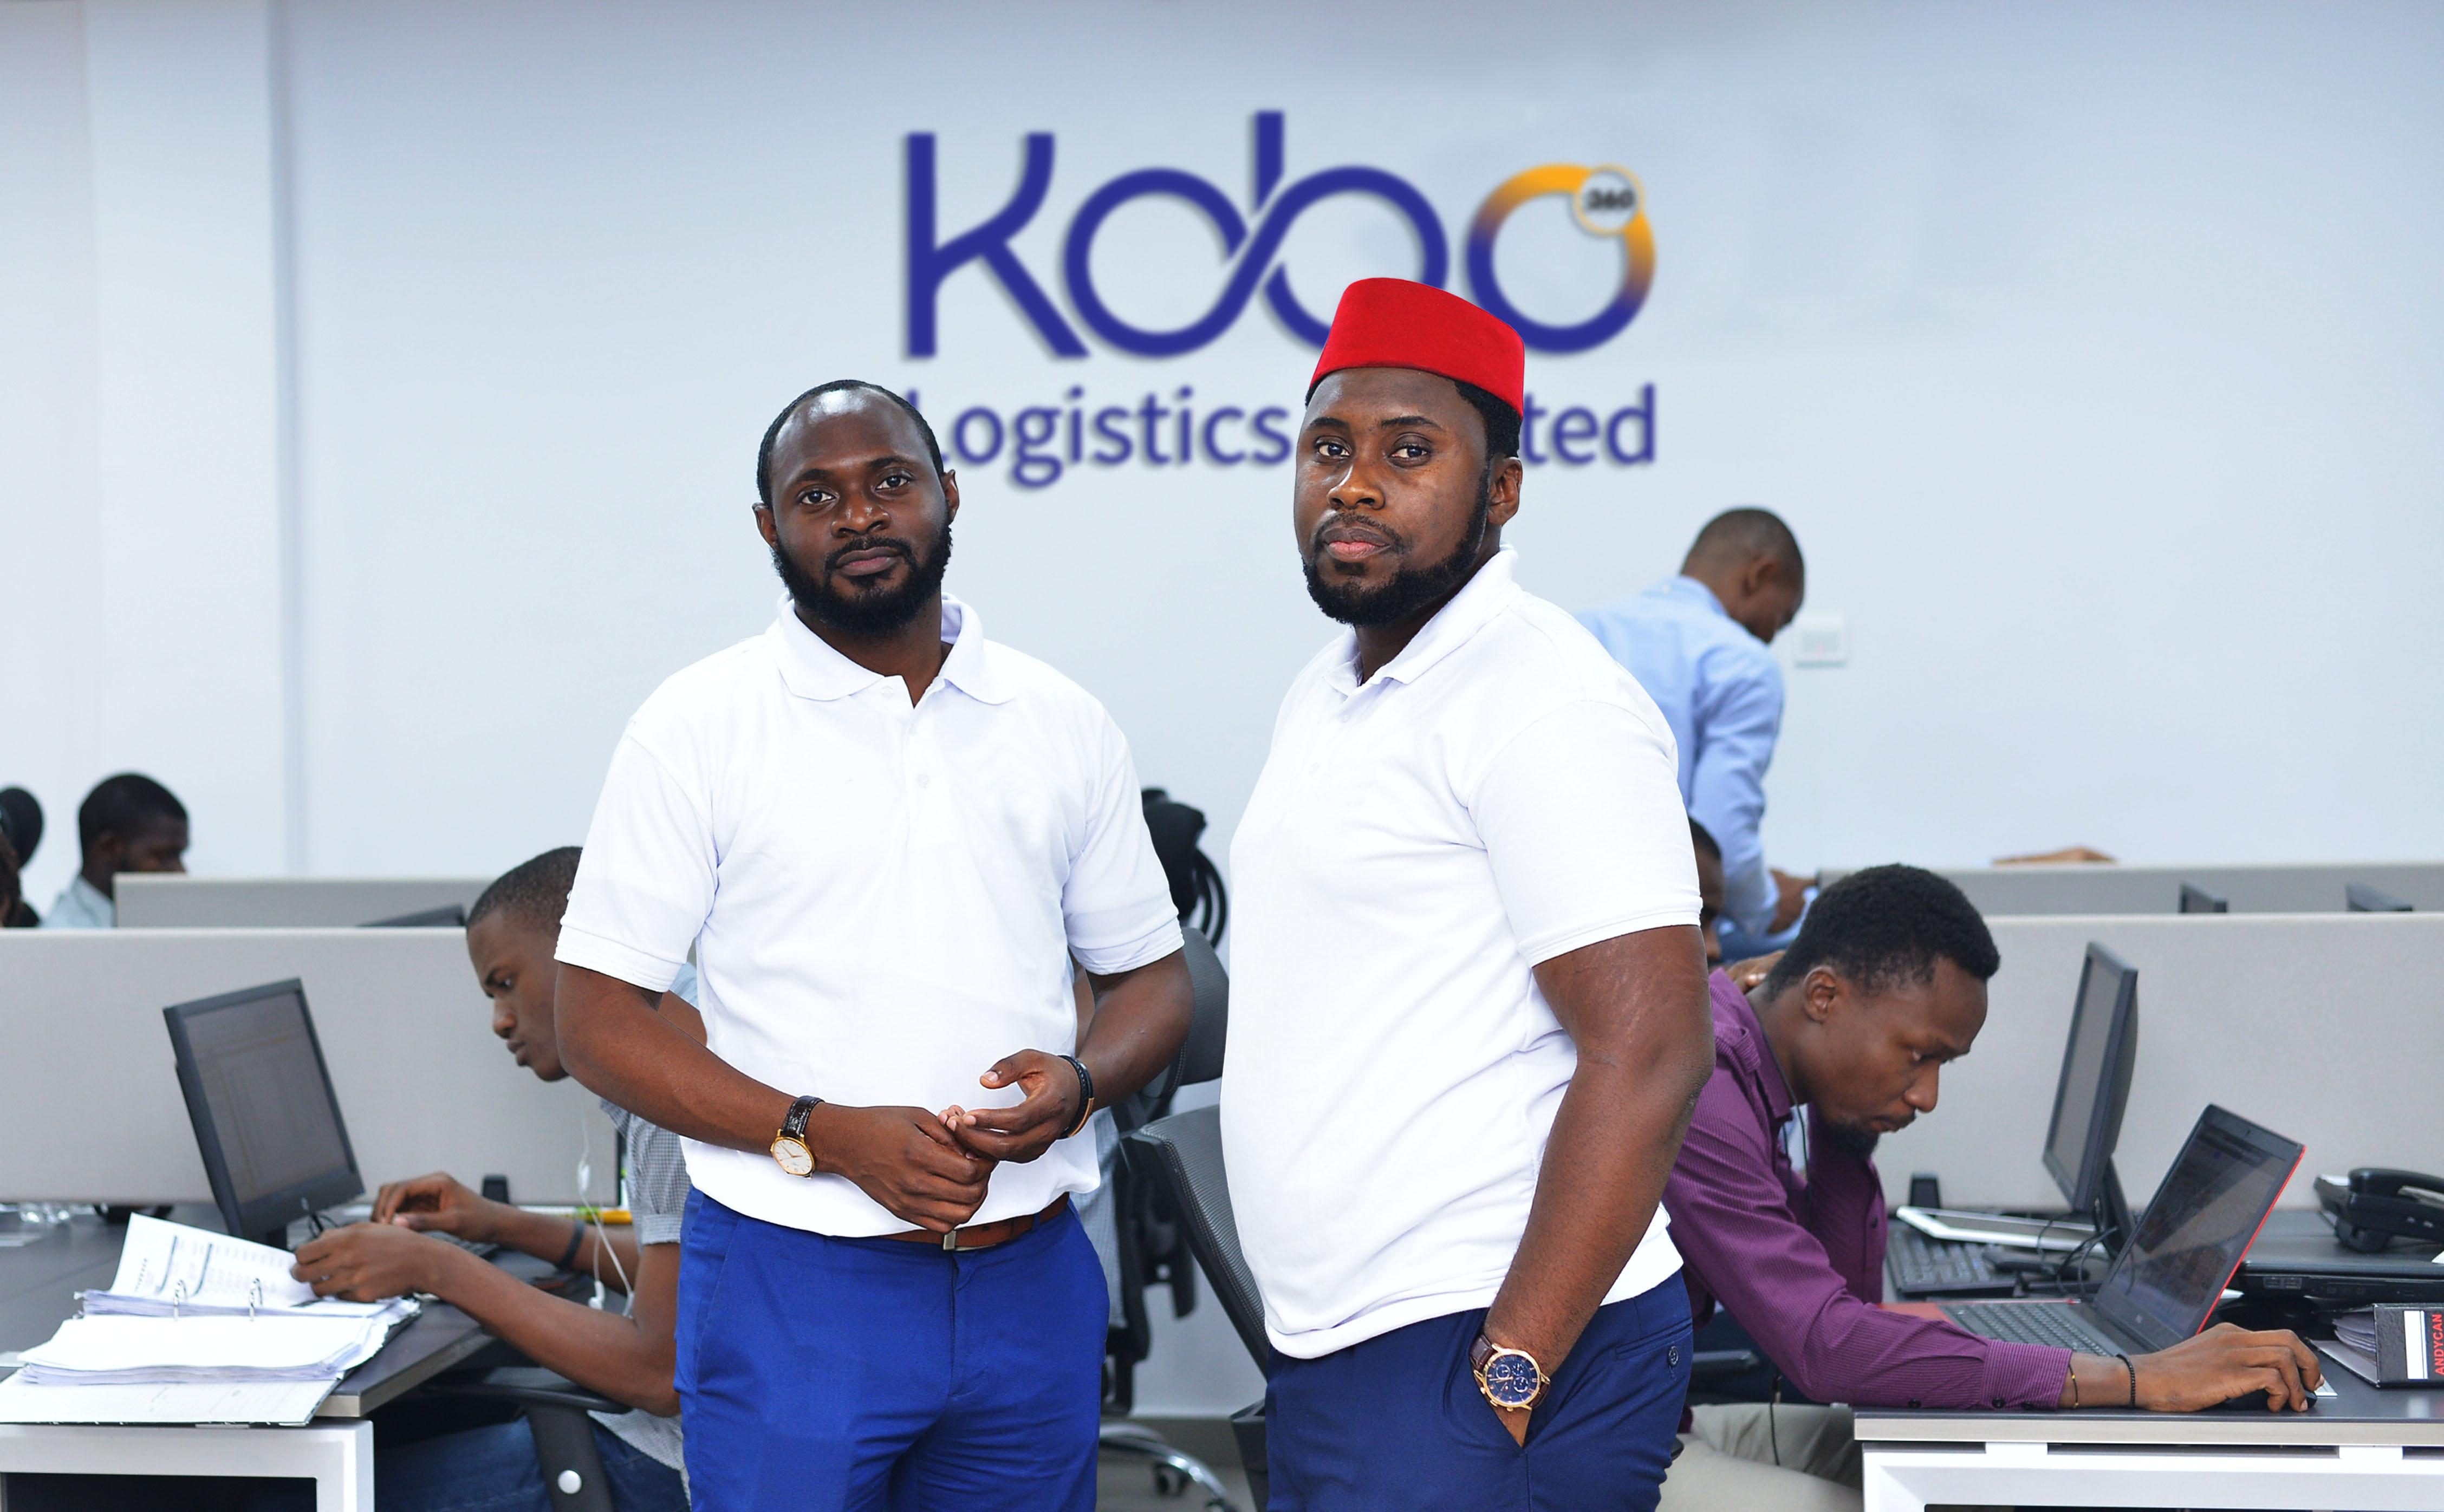 Nigerian logistics startup Kobo360 raises $30M backed by Goldman Sachs